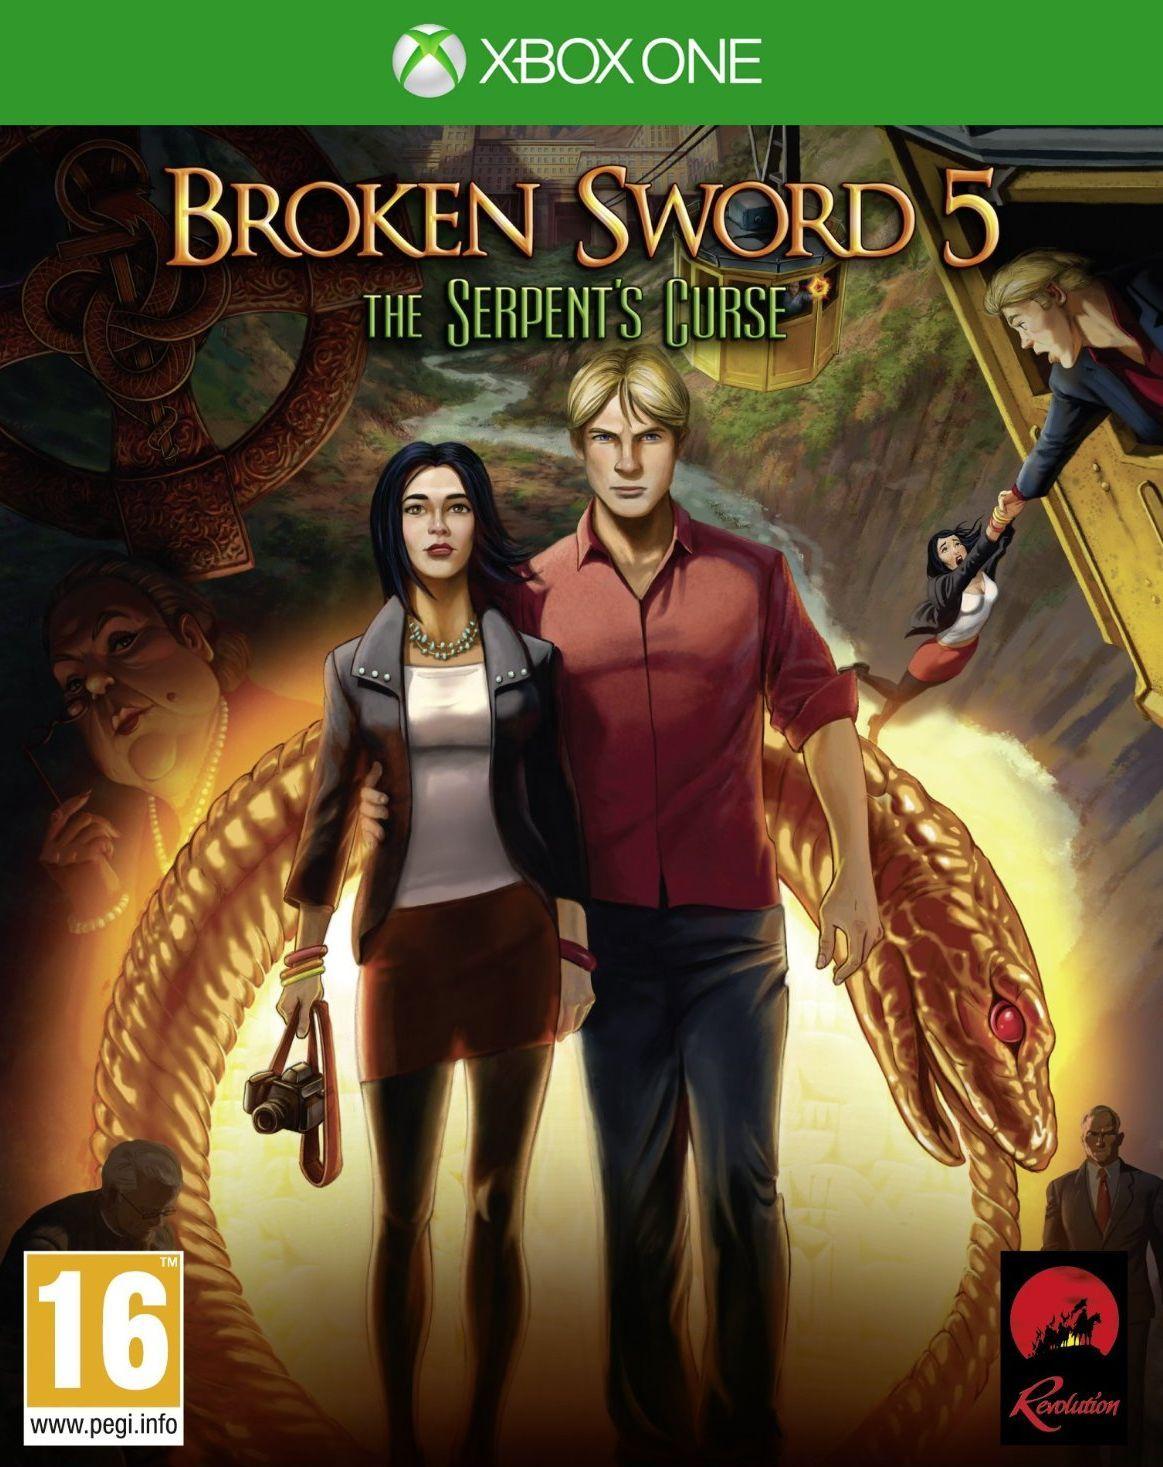 Broken Sword 5: The Serpent's Curse (Xbox One) - 1